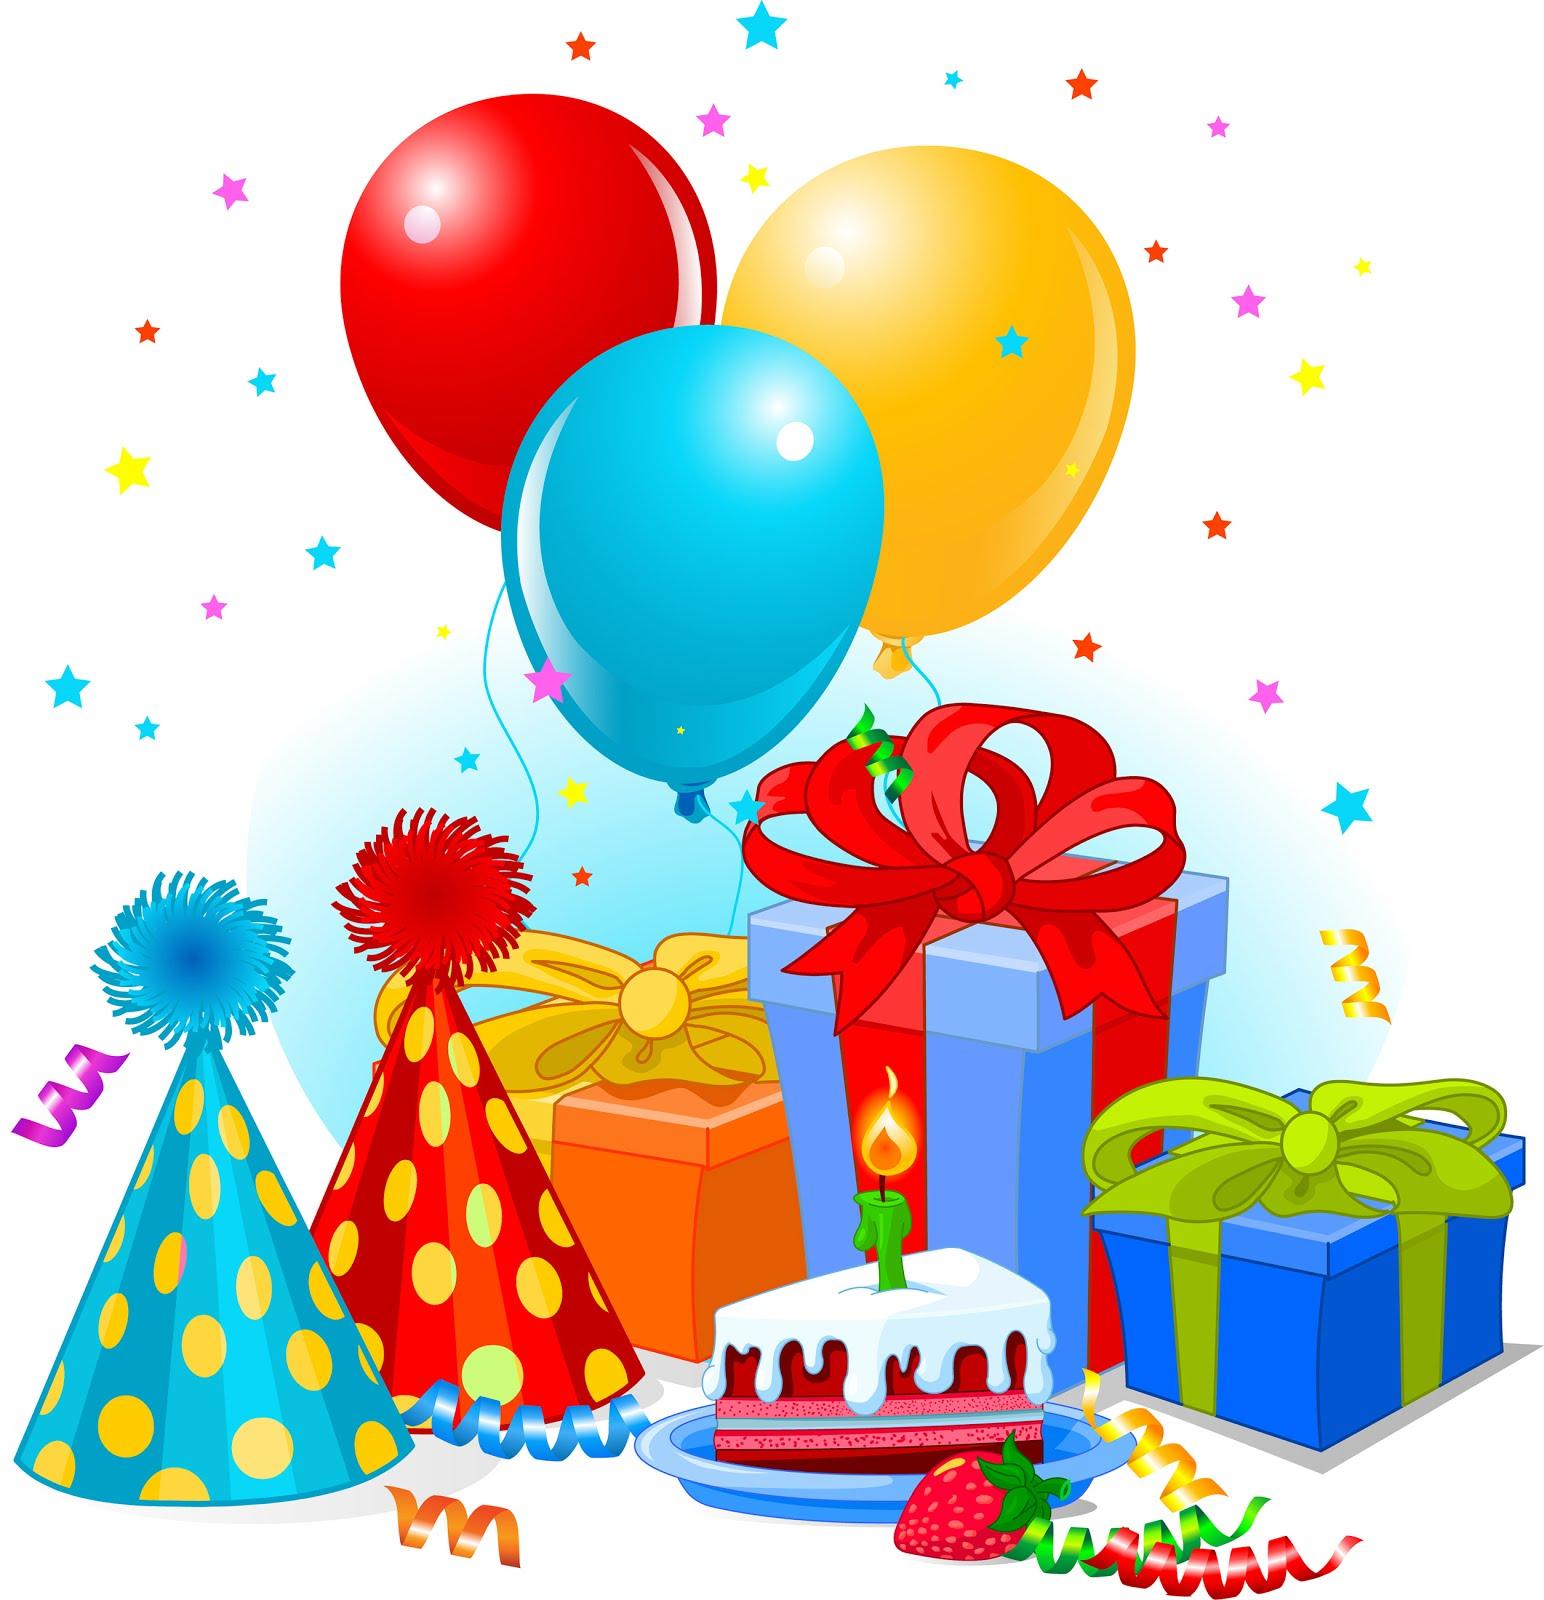 http://3.bp.blogspot.com/-hRNZNwdjYys/UPdwAHP1BGI/AAAAAAABg0s/keKWb8RGDKc/s1600/postal-de-cumplea%25C3%25B1os-happy-birthday-felicidades-en-tu-cumple-.jpg